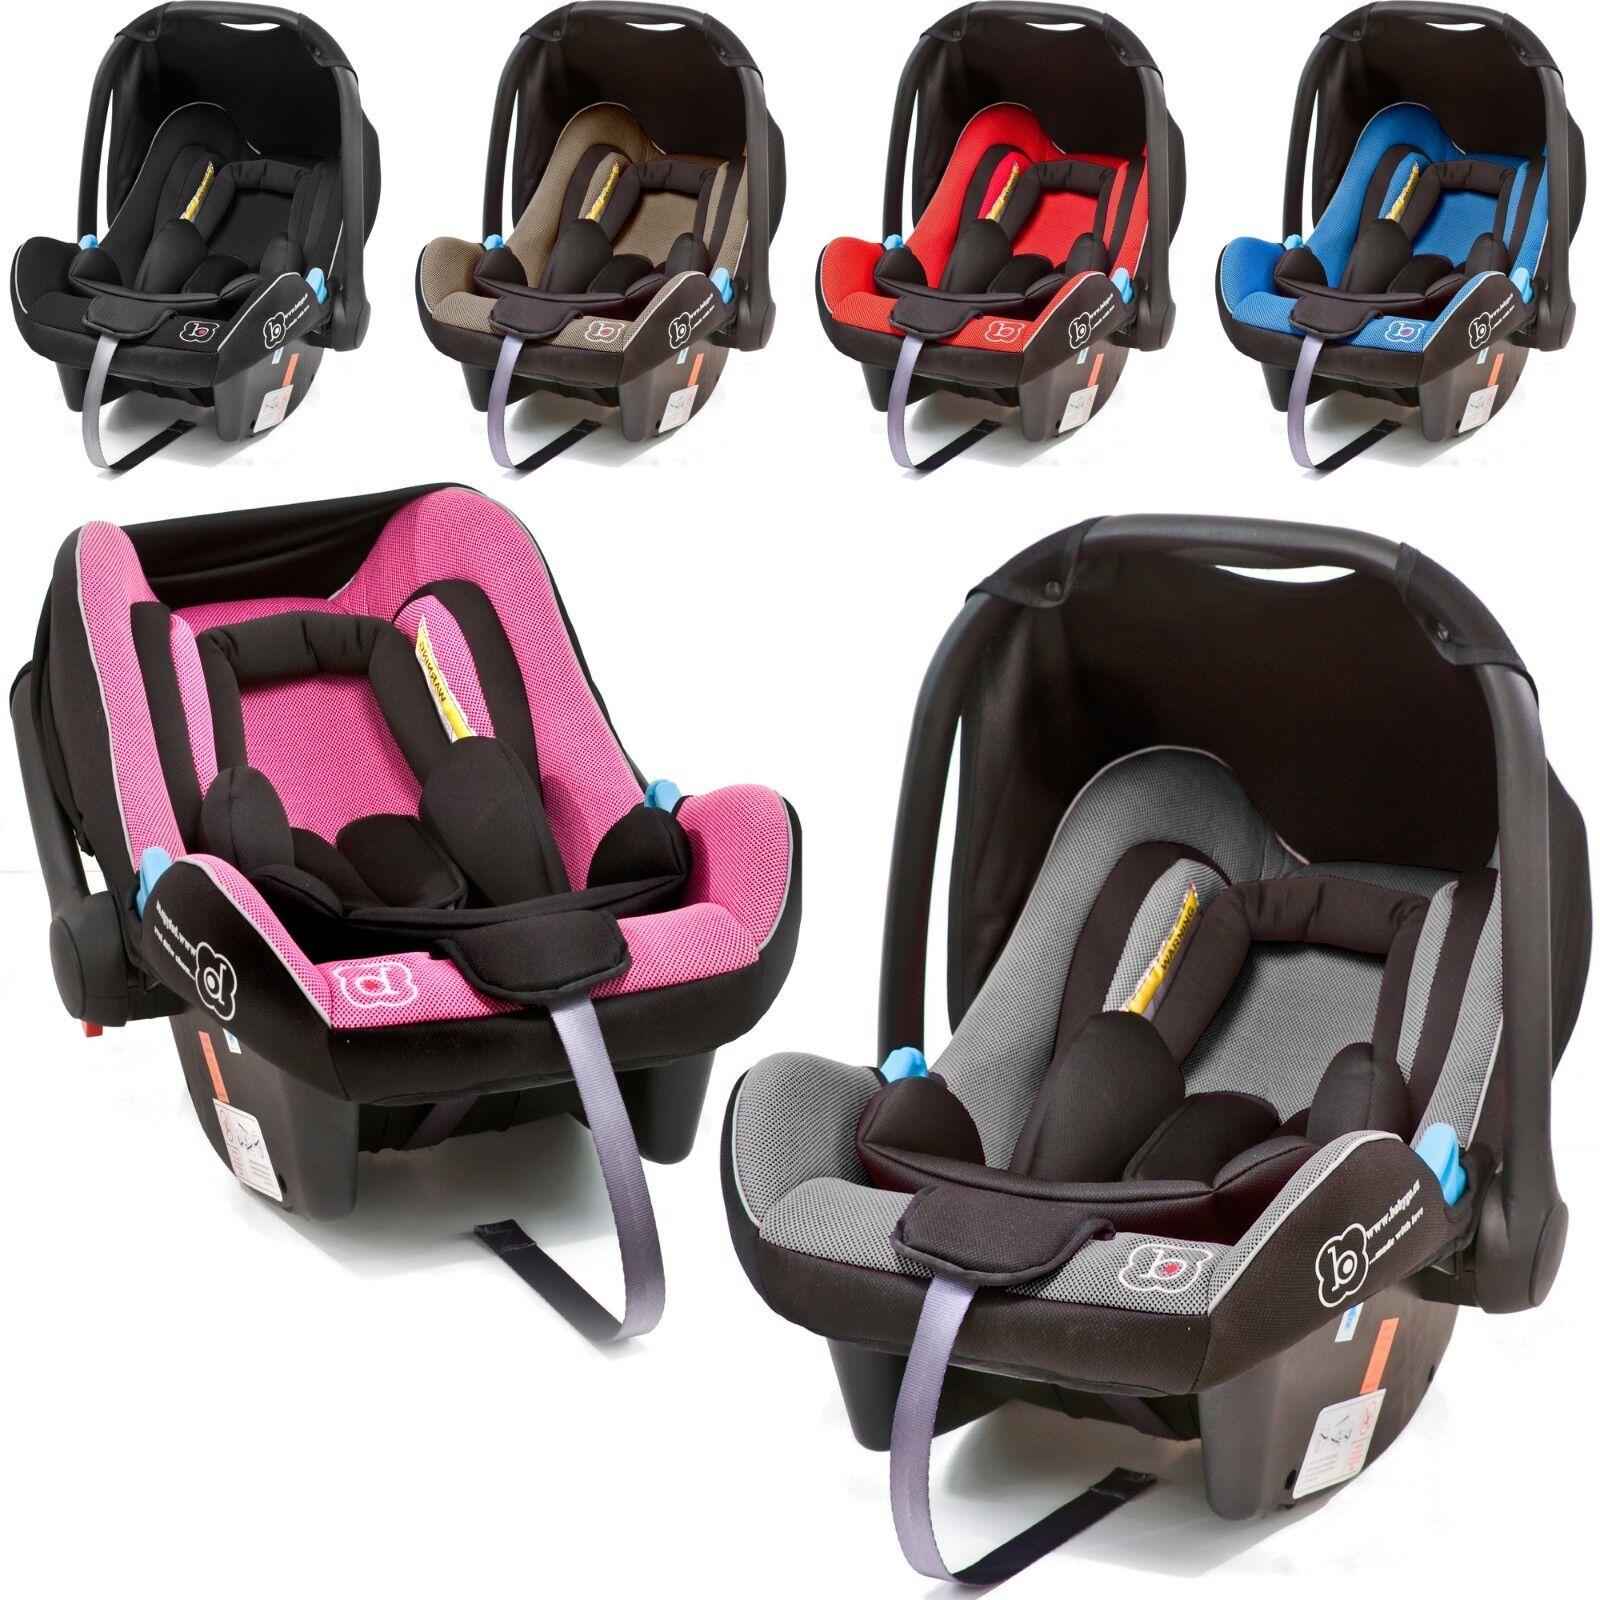 Babyschale Autositz Kindersitz Travel XP 0-13kg Auto Kinder Babysitz Baby BabyGo